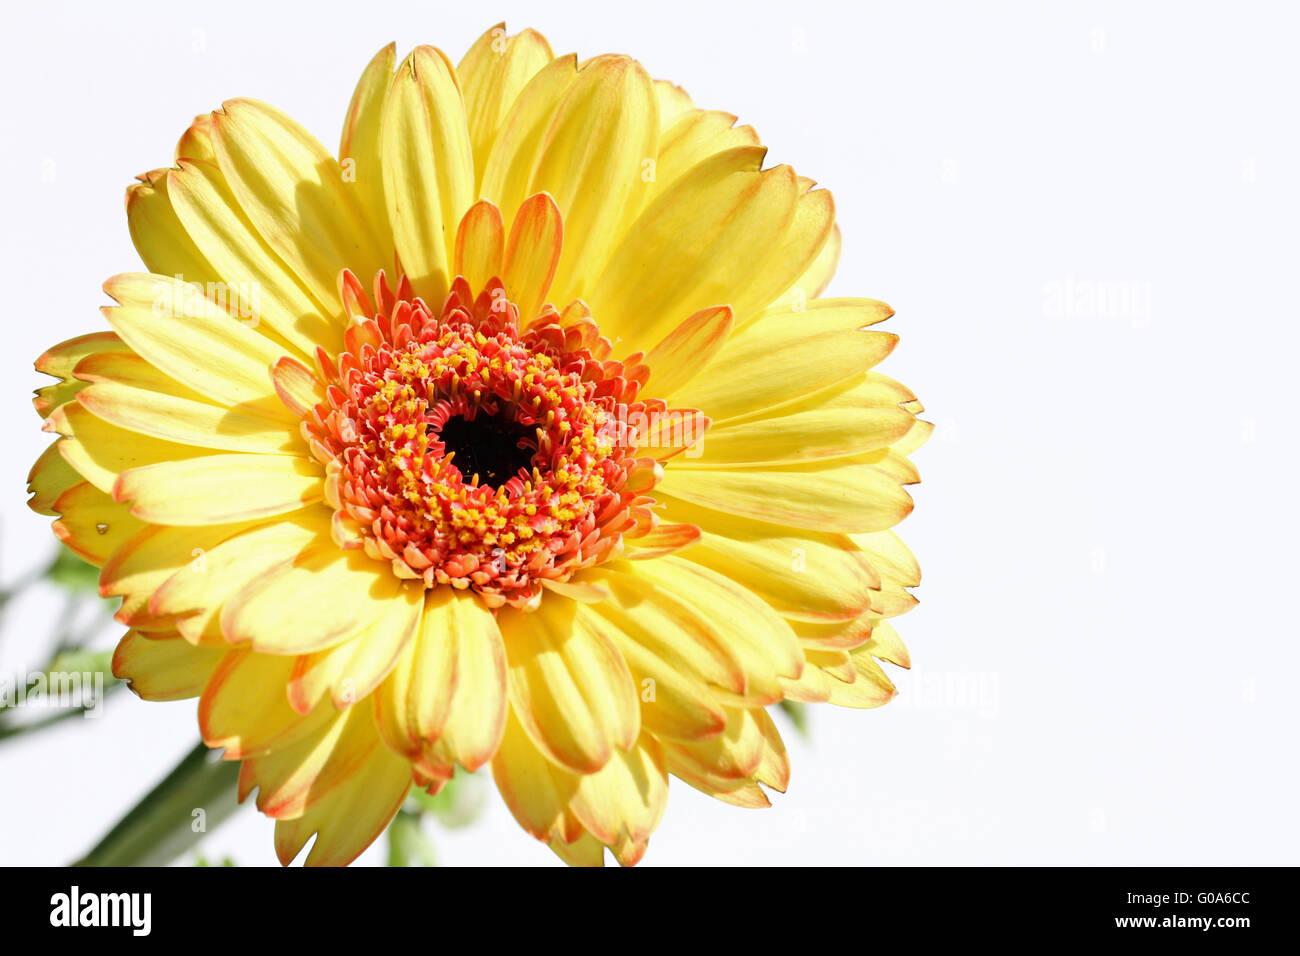 shining flower - Stock Image